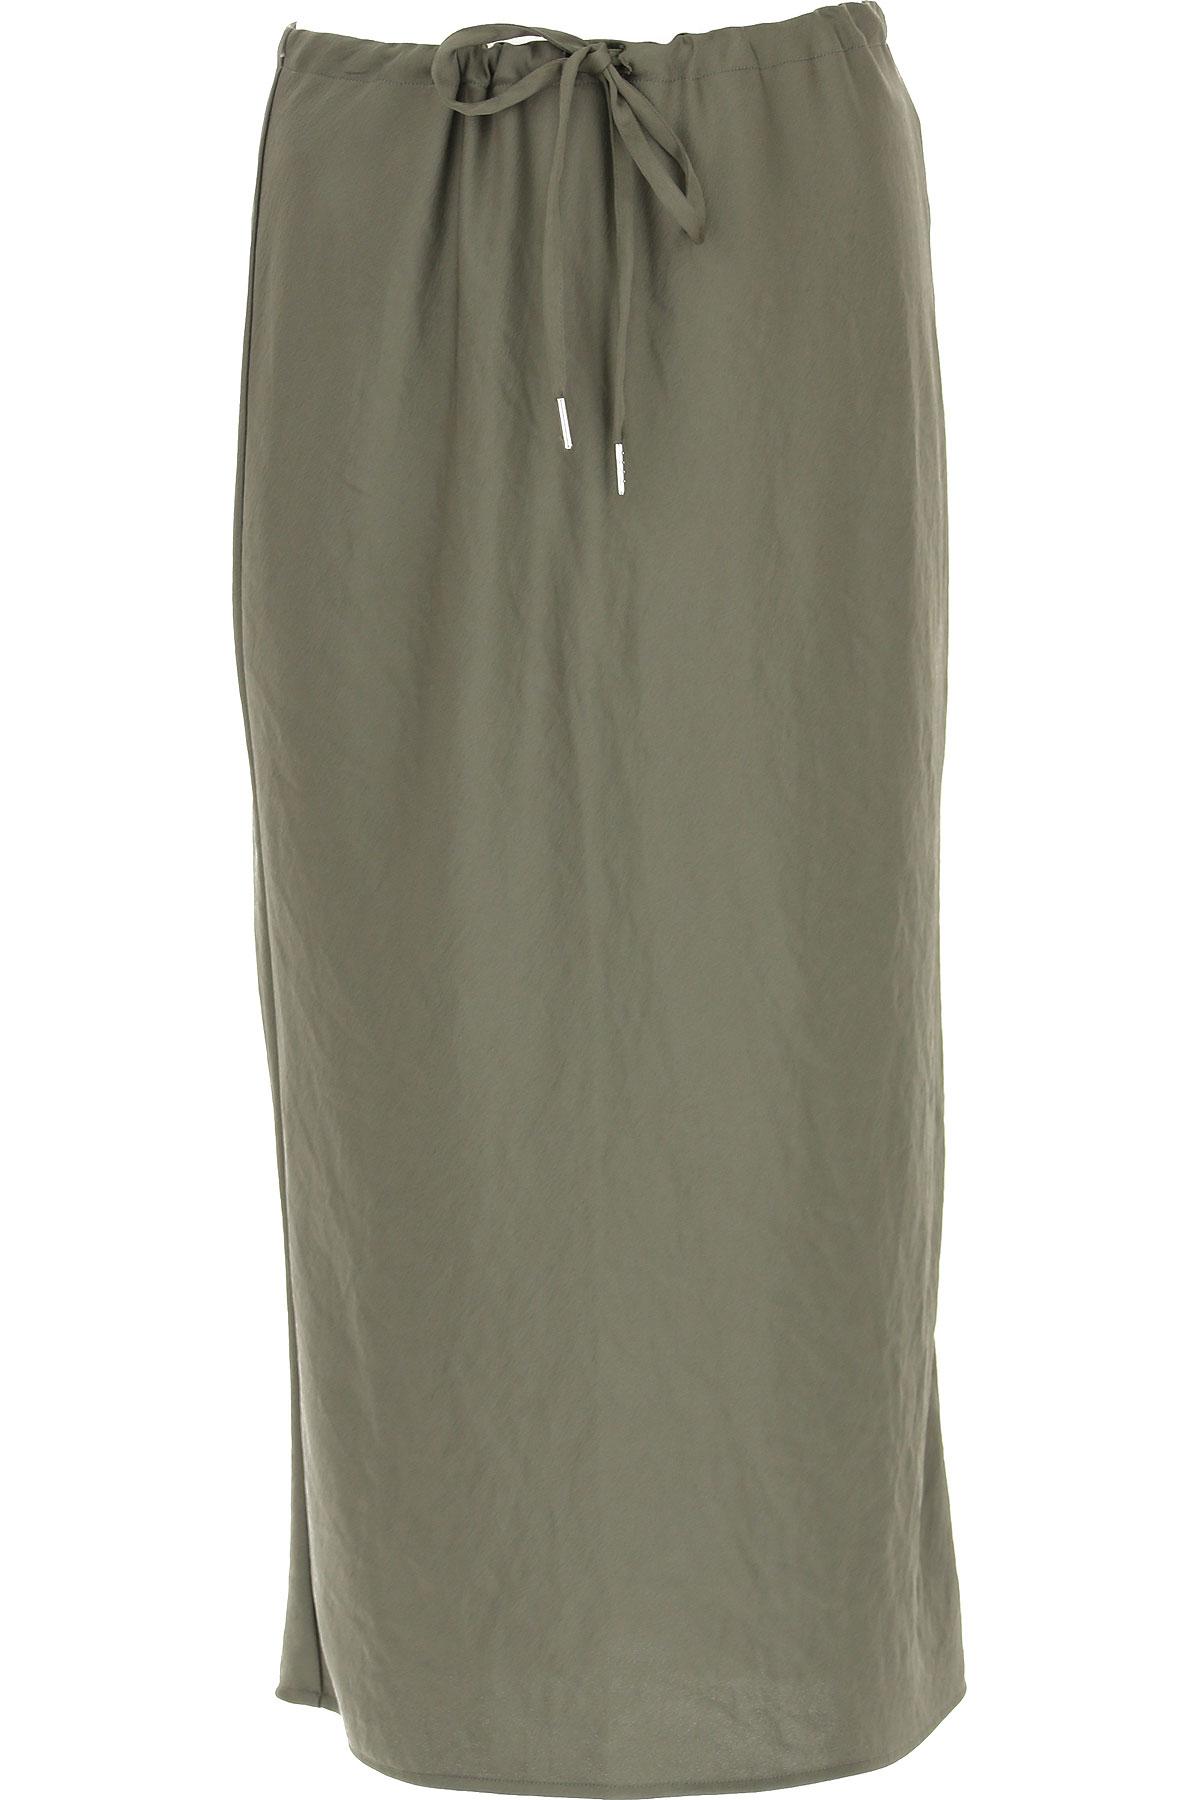 Alexander Wang Skirt for Women On Sale, Grey, polyestere, 2019, 4 6